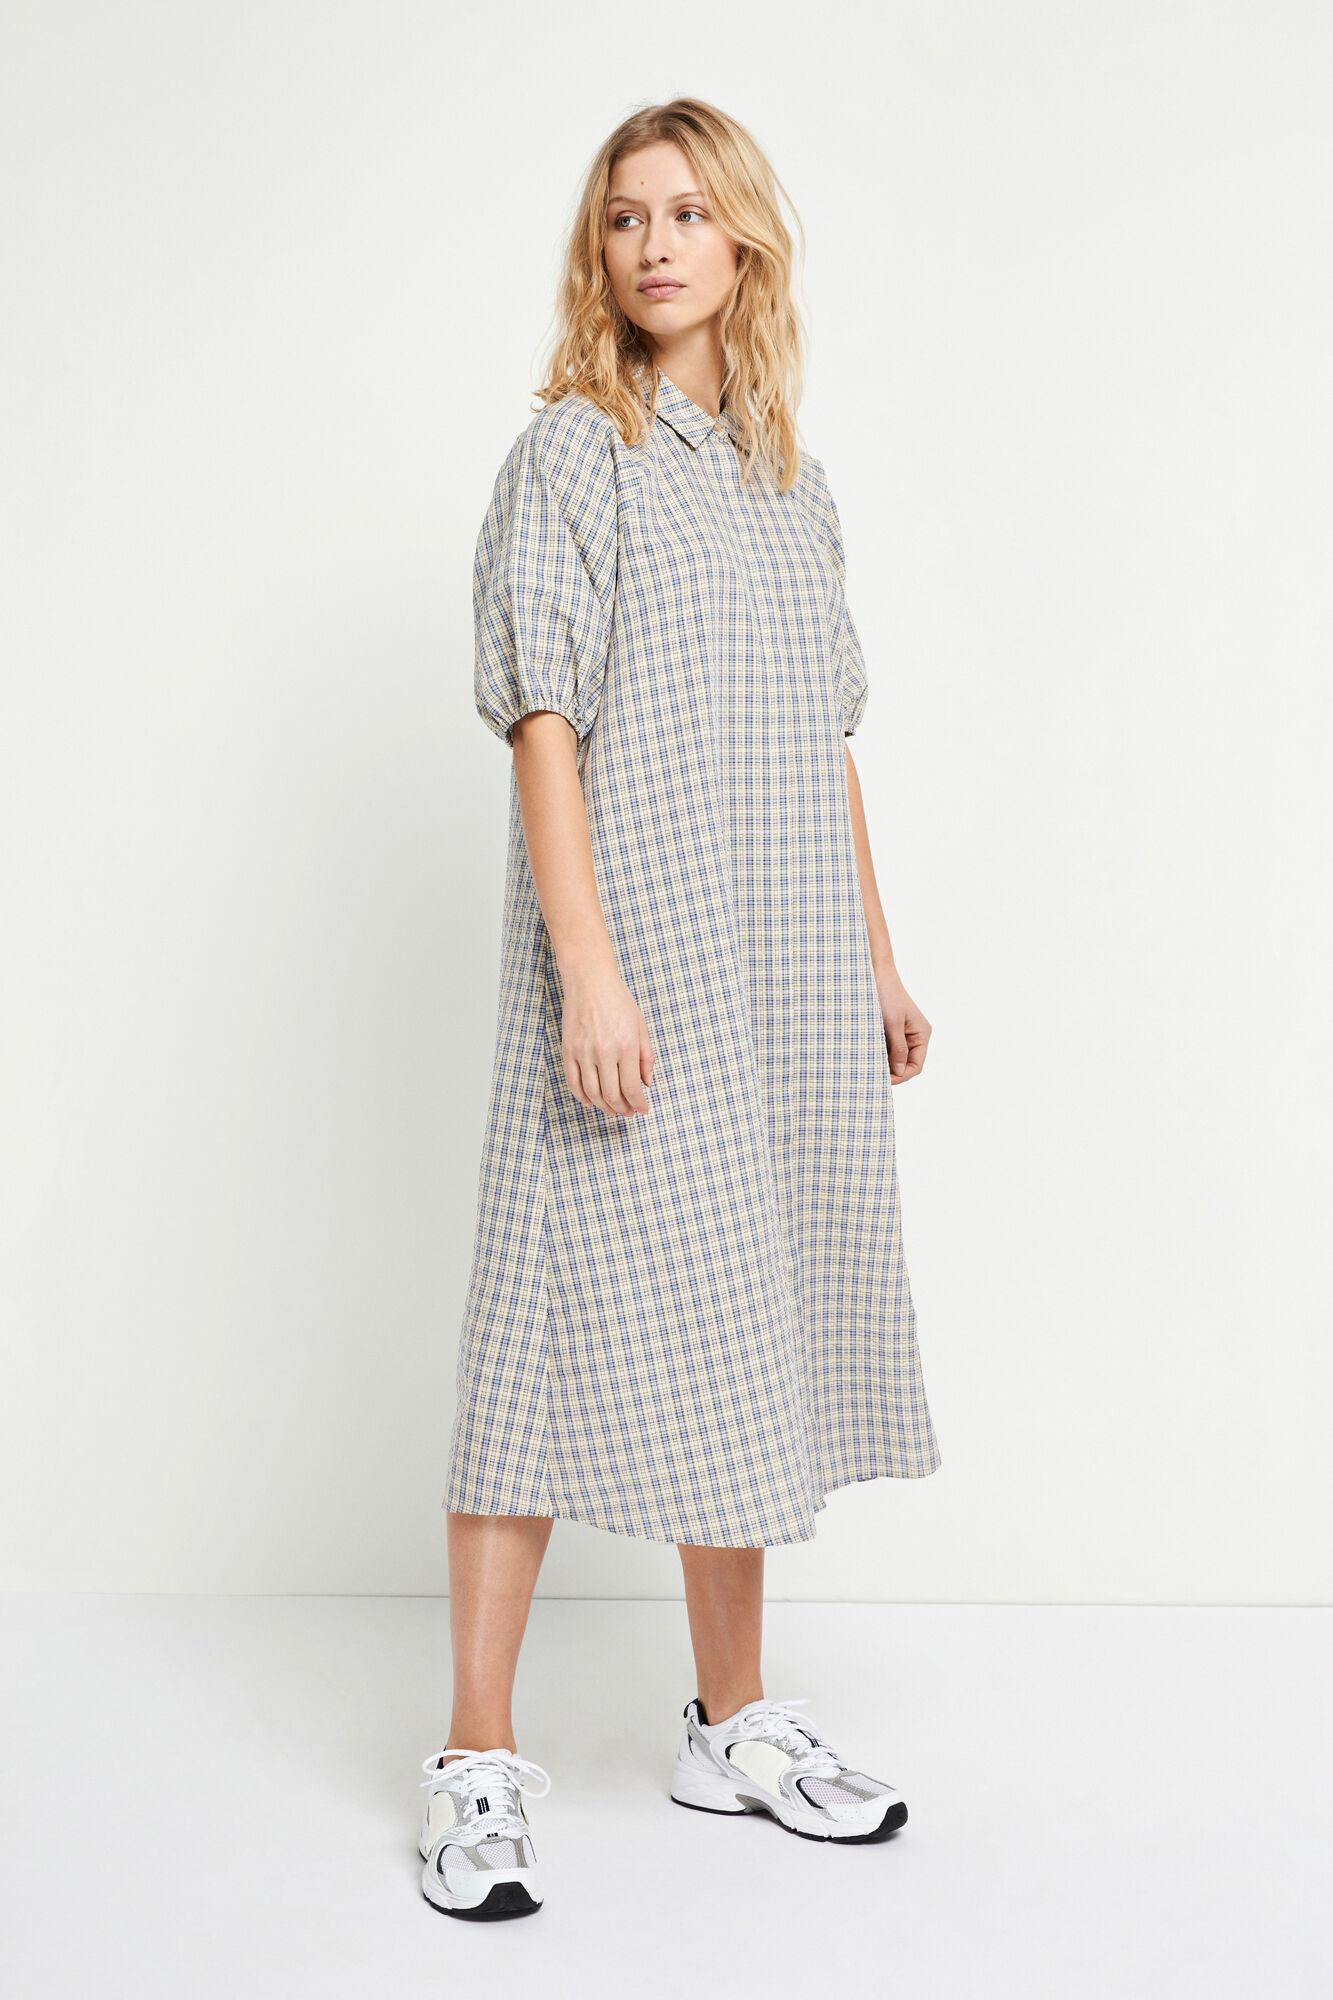 ENRAYES SS DRESS 6715